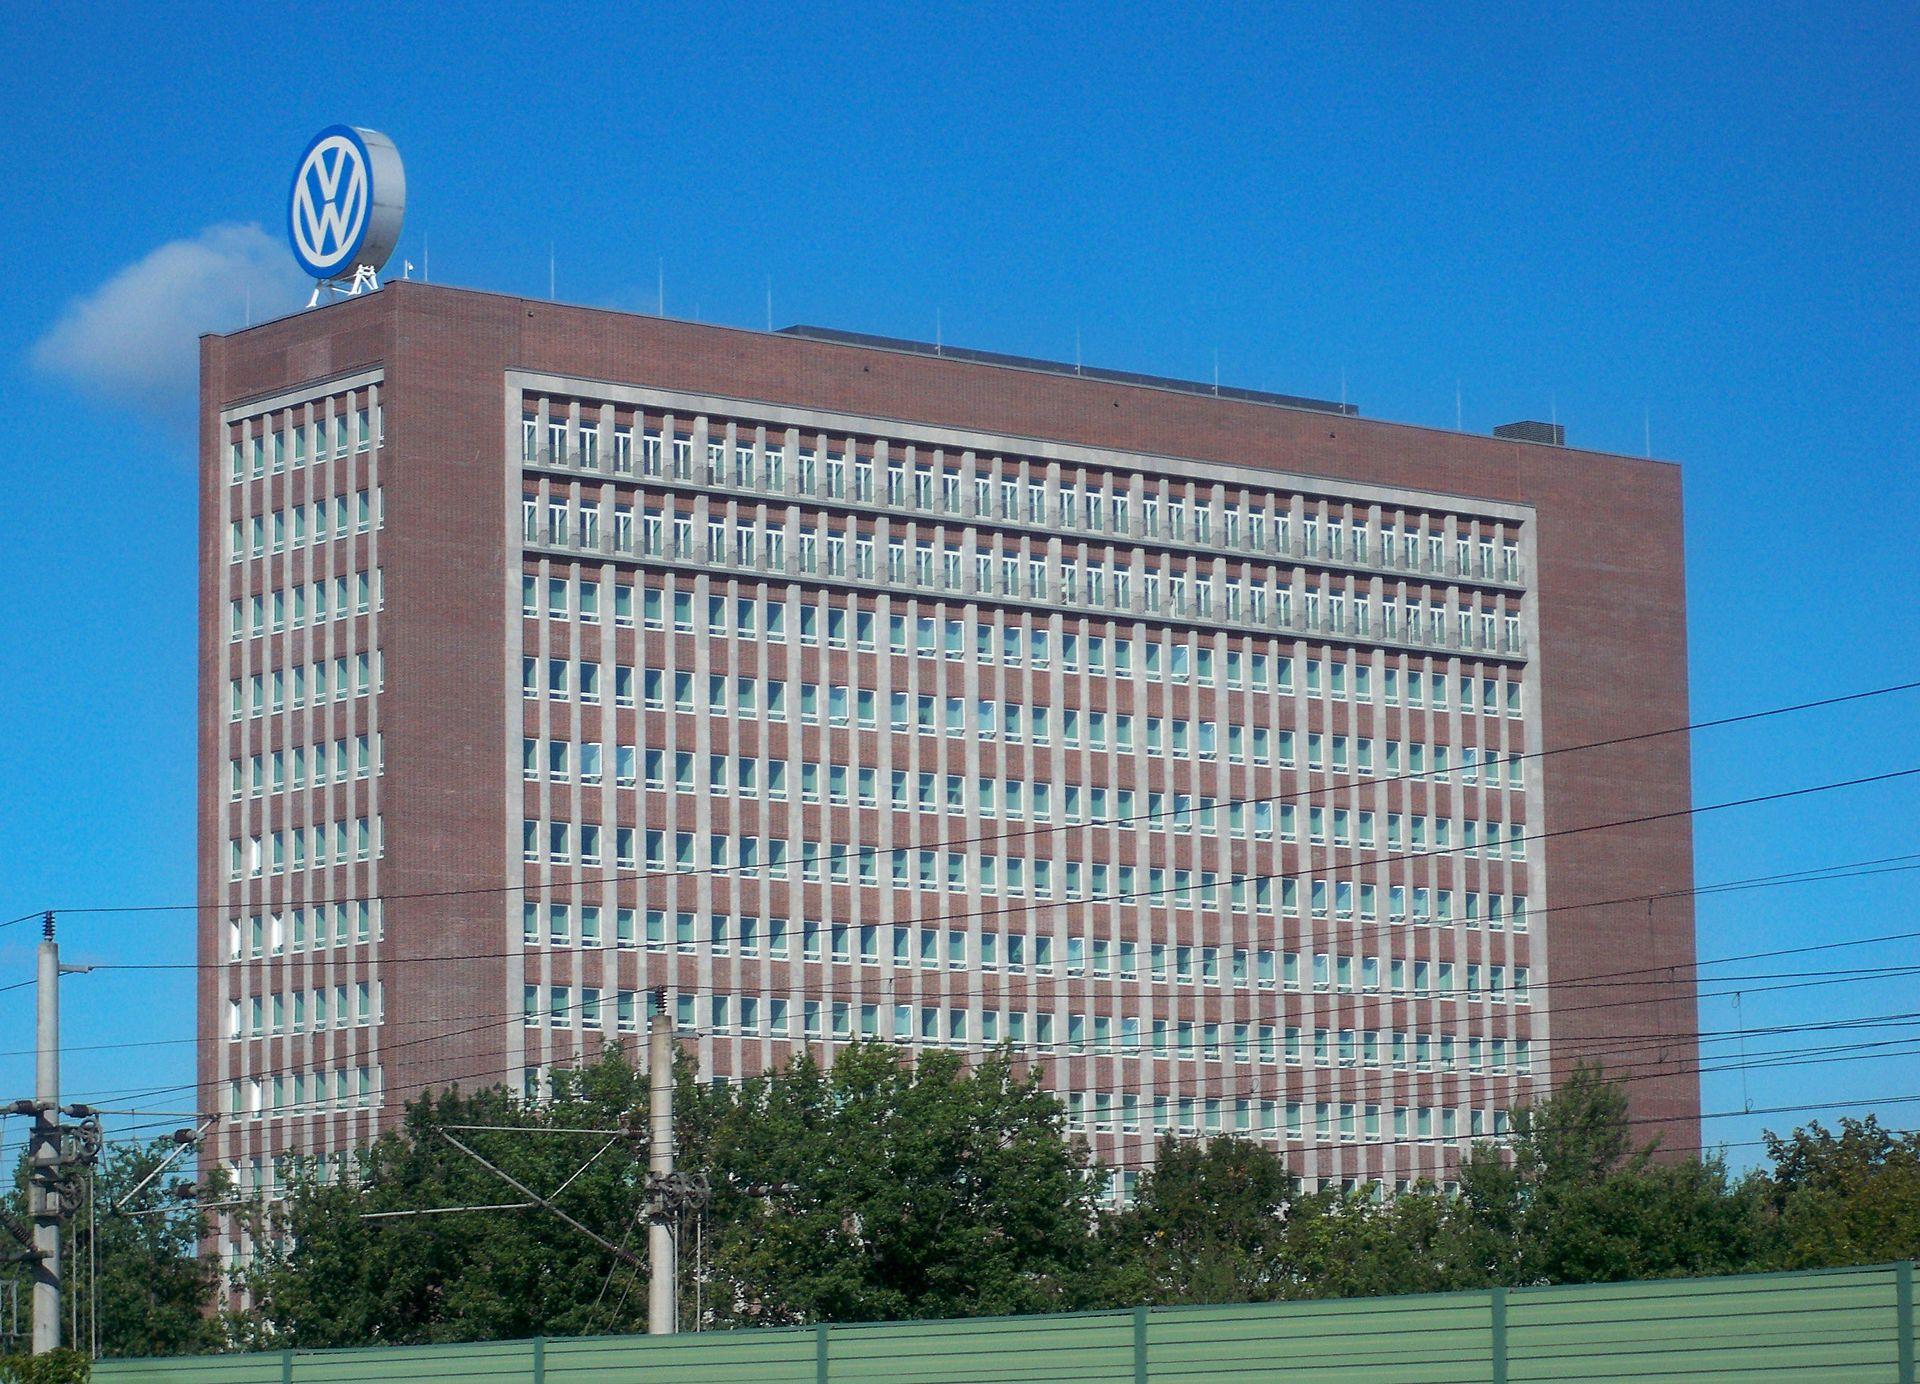 VW-Verwaltungshochhaus – Wikipedia